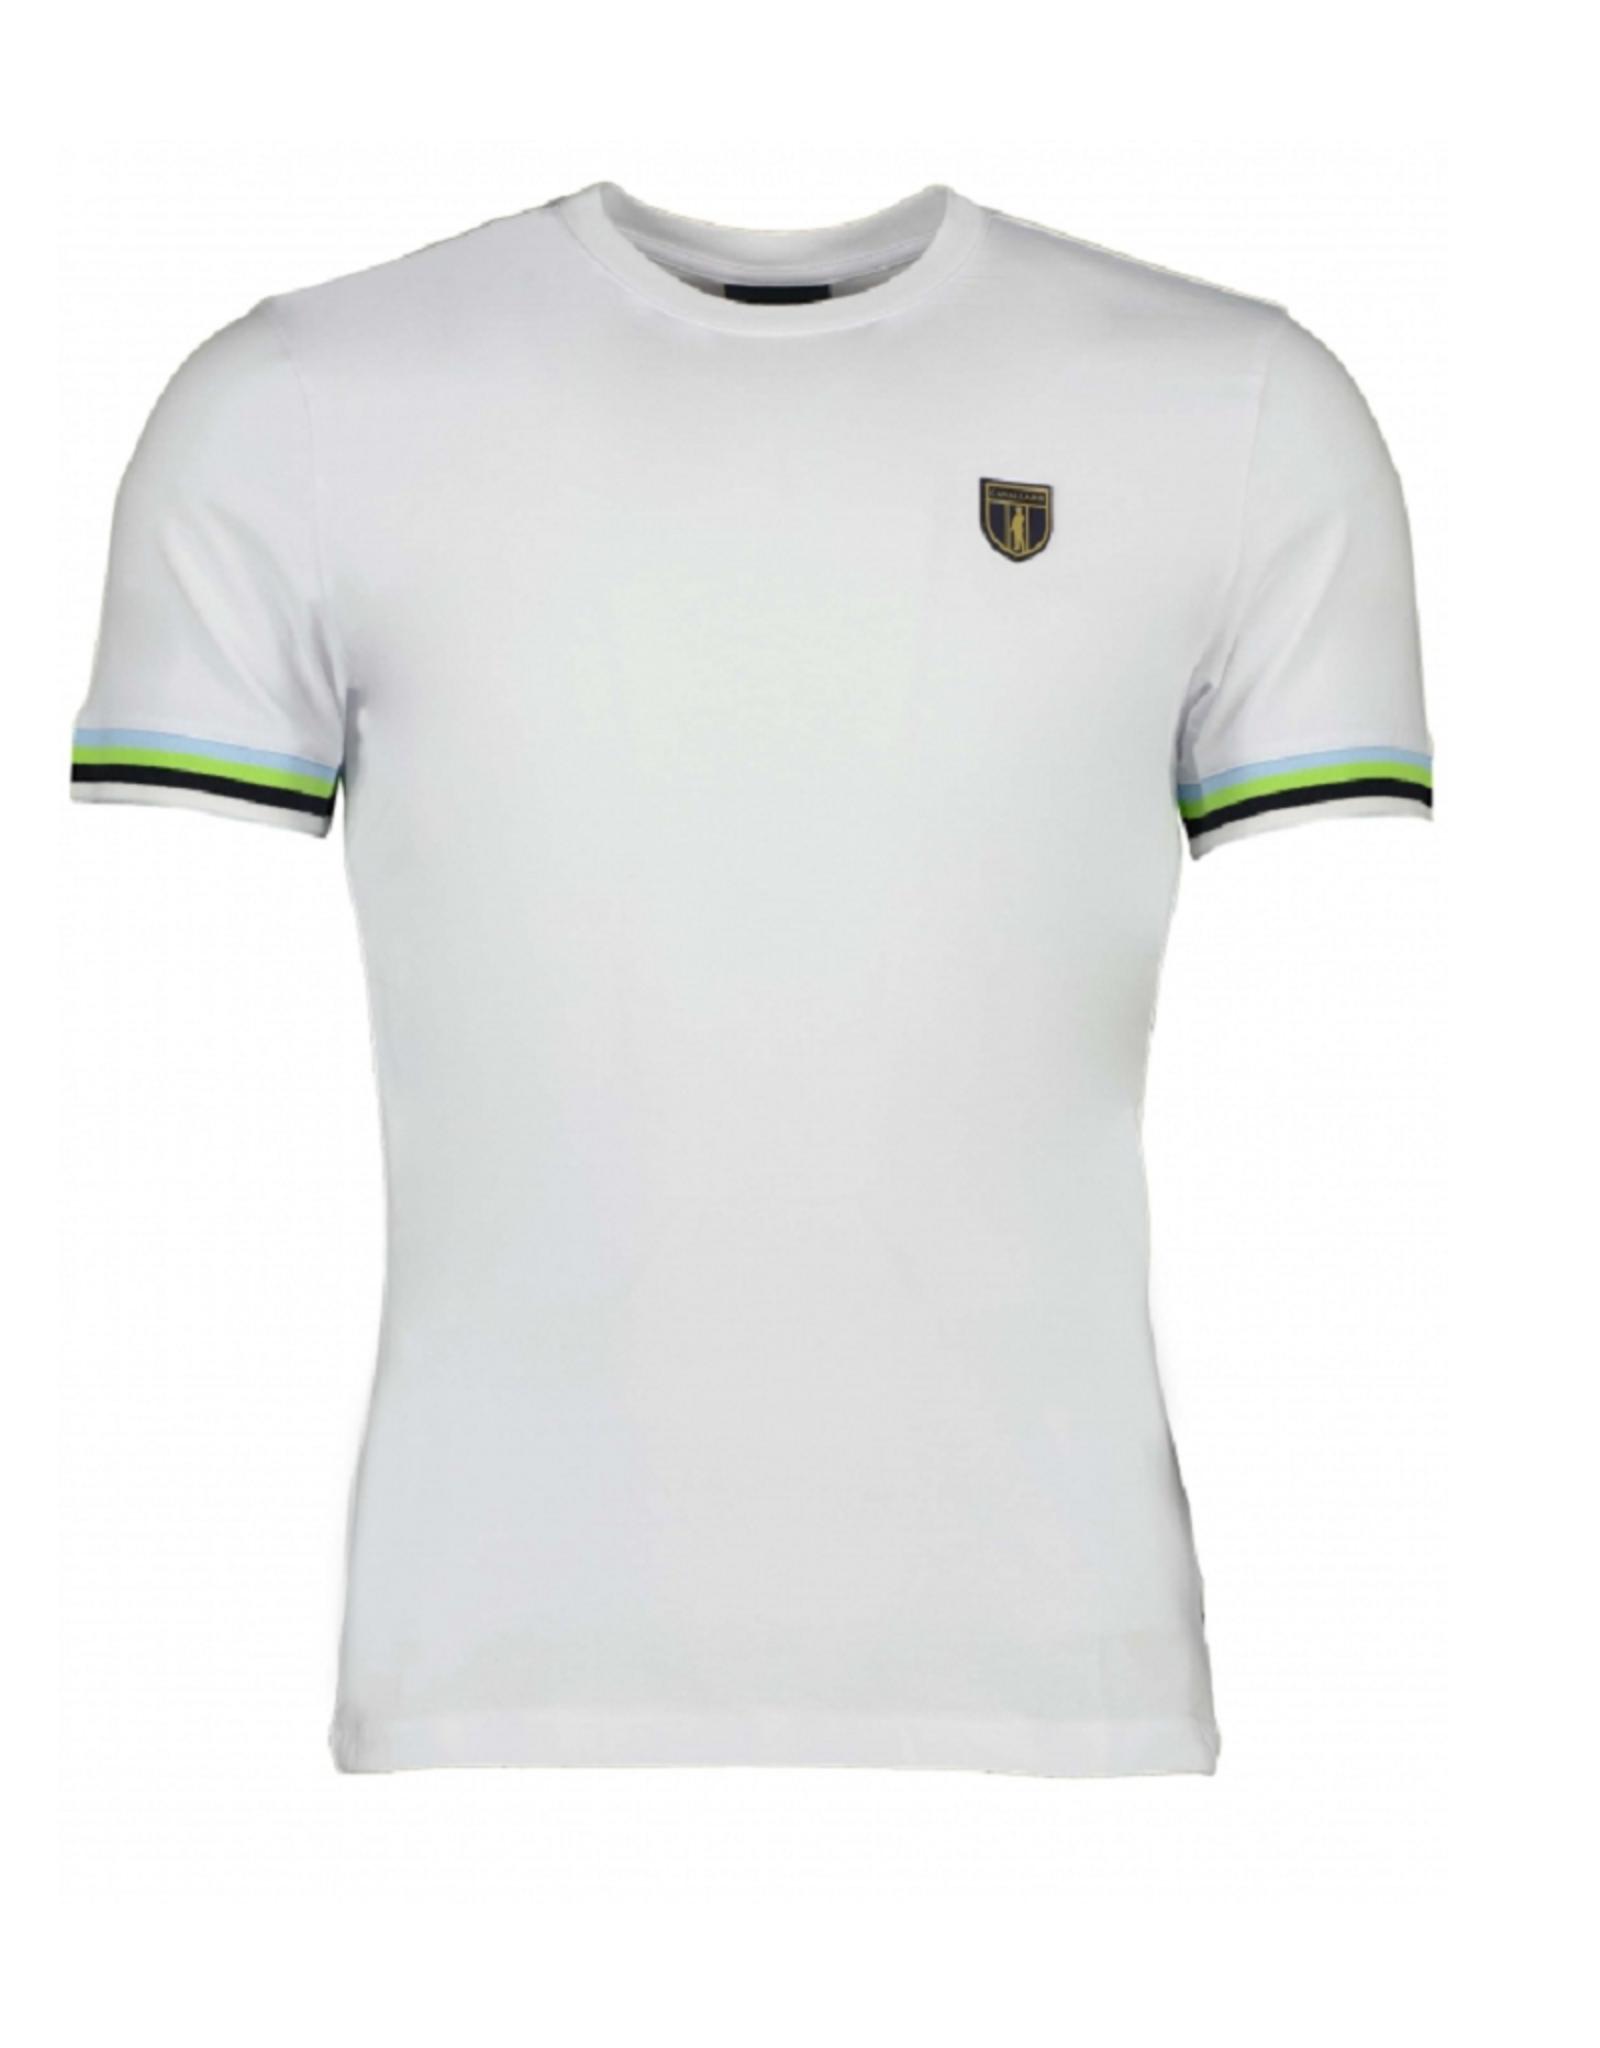 Cavallaro Cavallaro Gelato t-shirt wit